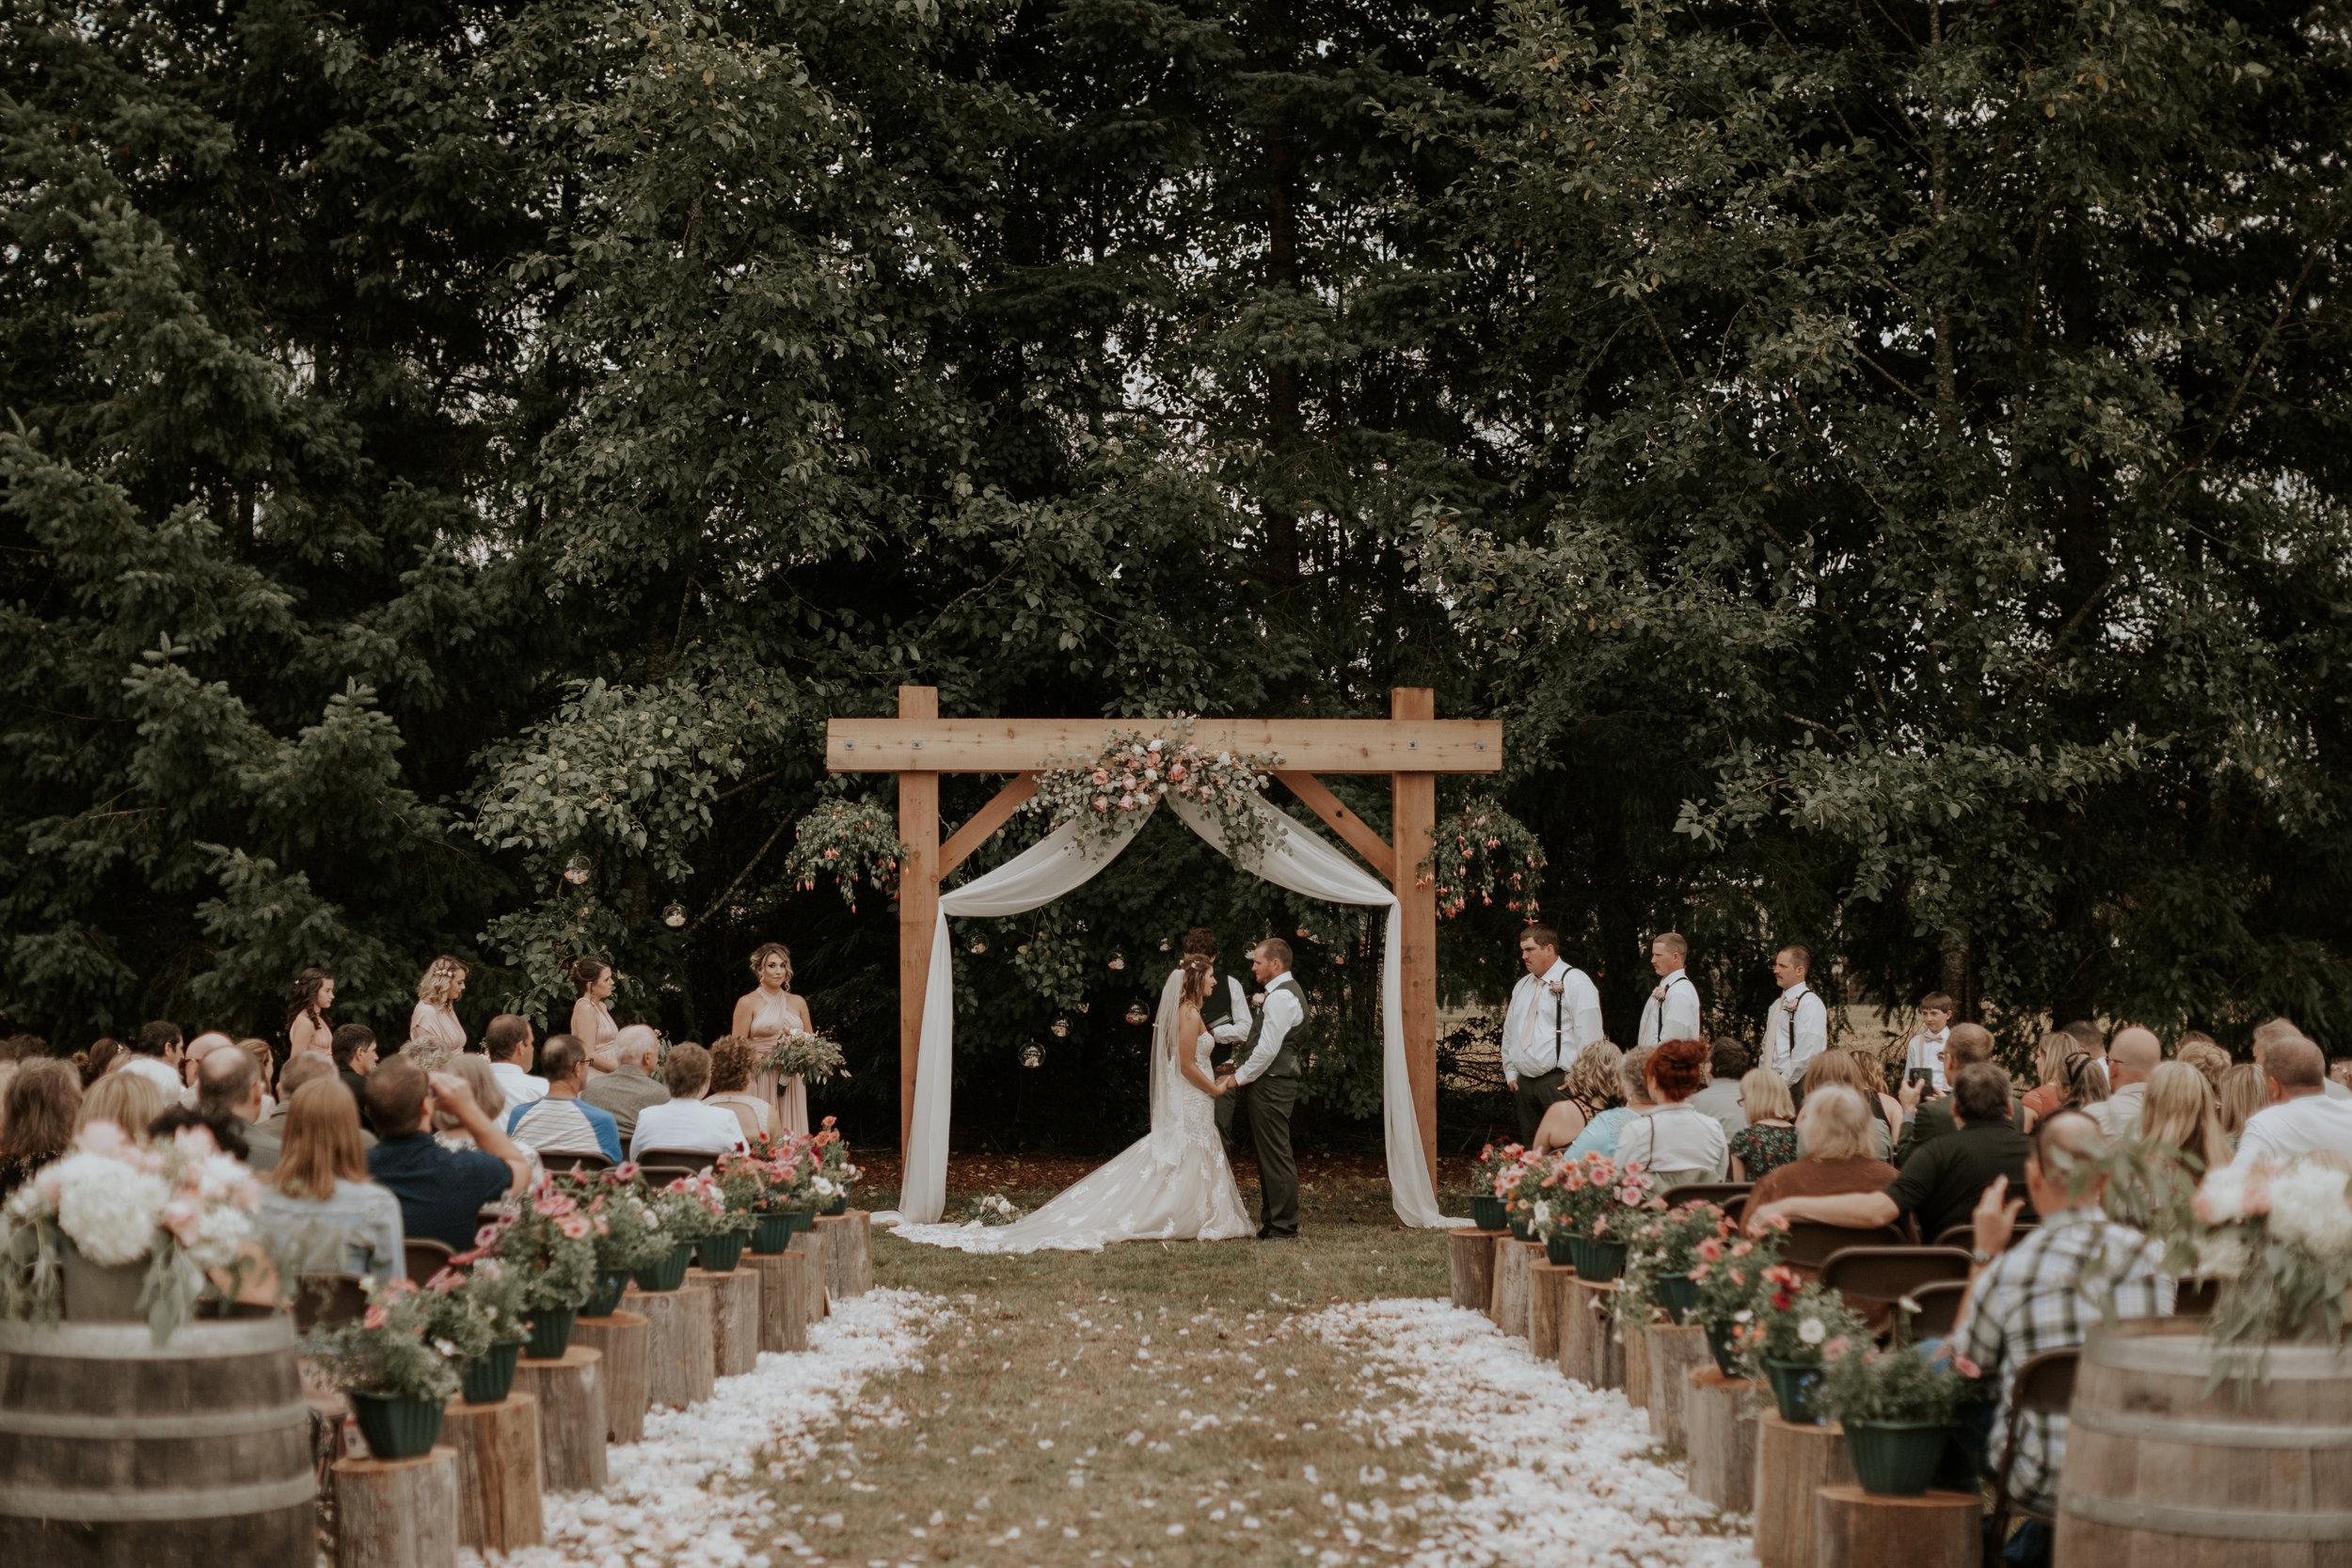 Olympic-Peninsula-Wedding-Photographer-PNW-Forks-Port-Angeles-Kayla-Dawn-Photography-engagement-Olympic-National-Park-59.jpg